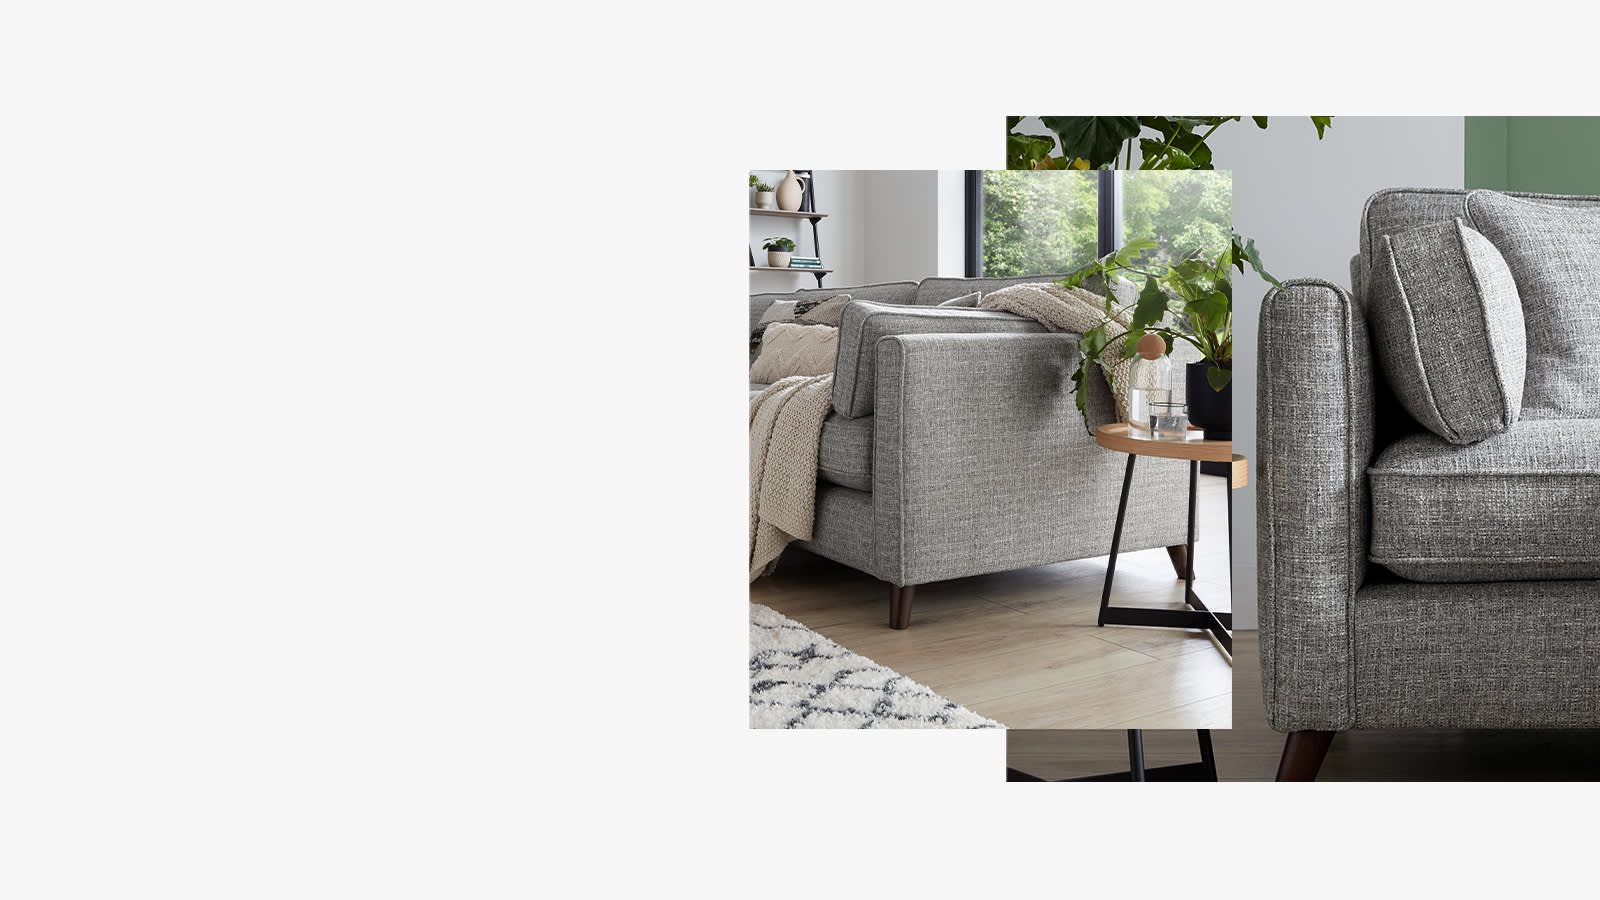 Sofology Castille grey fabric sofa